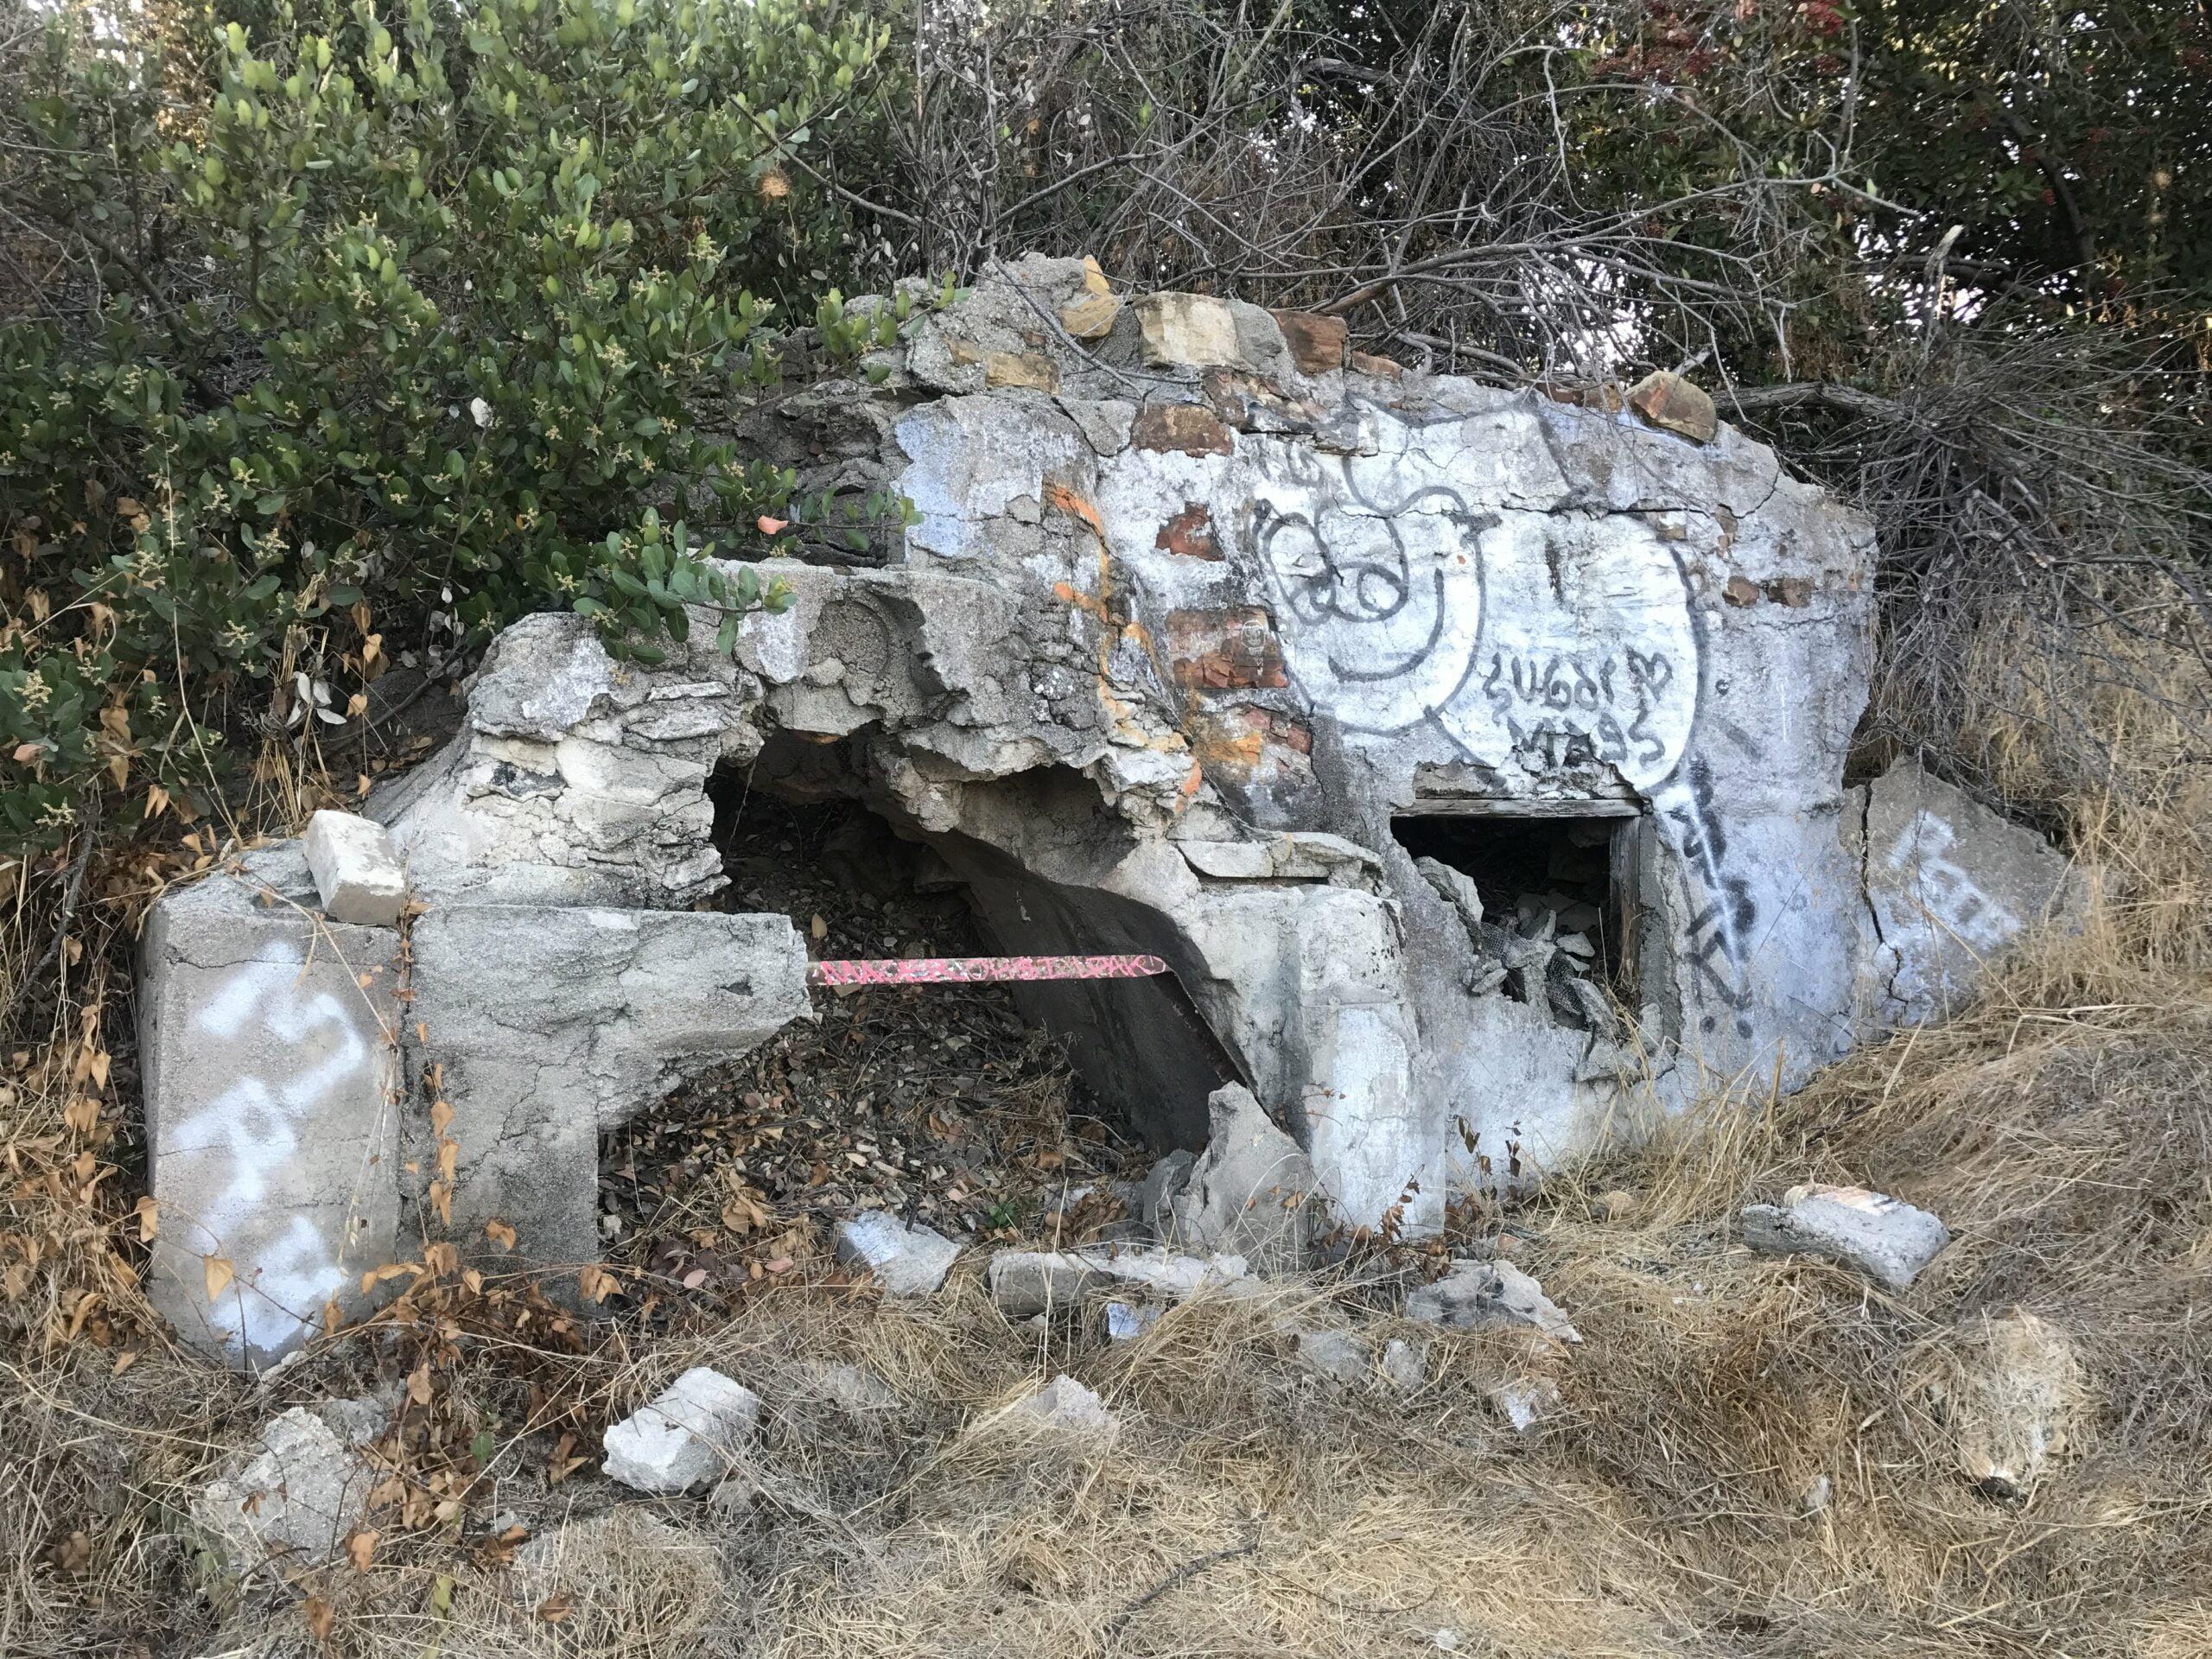 ernest e debs regional park graffiti